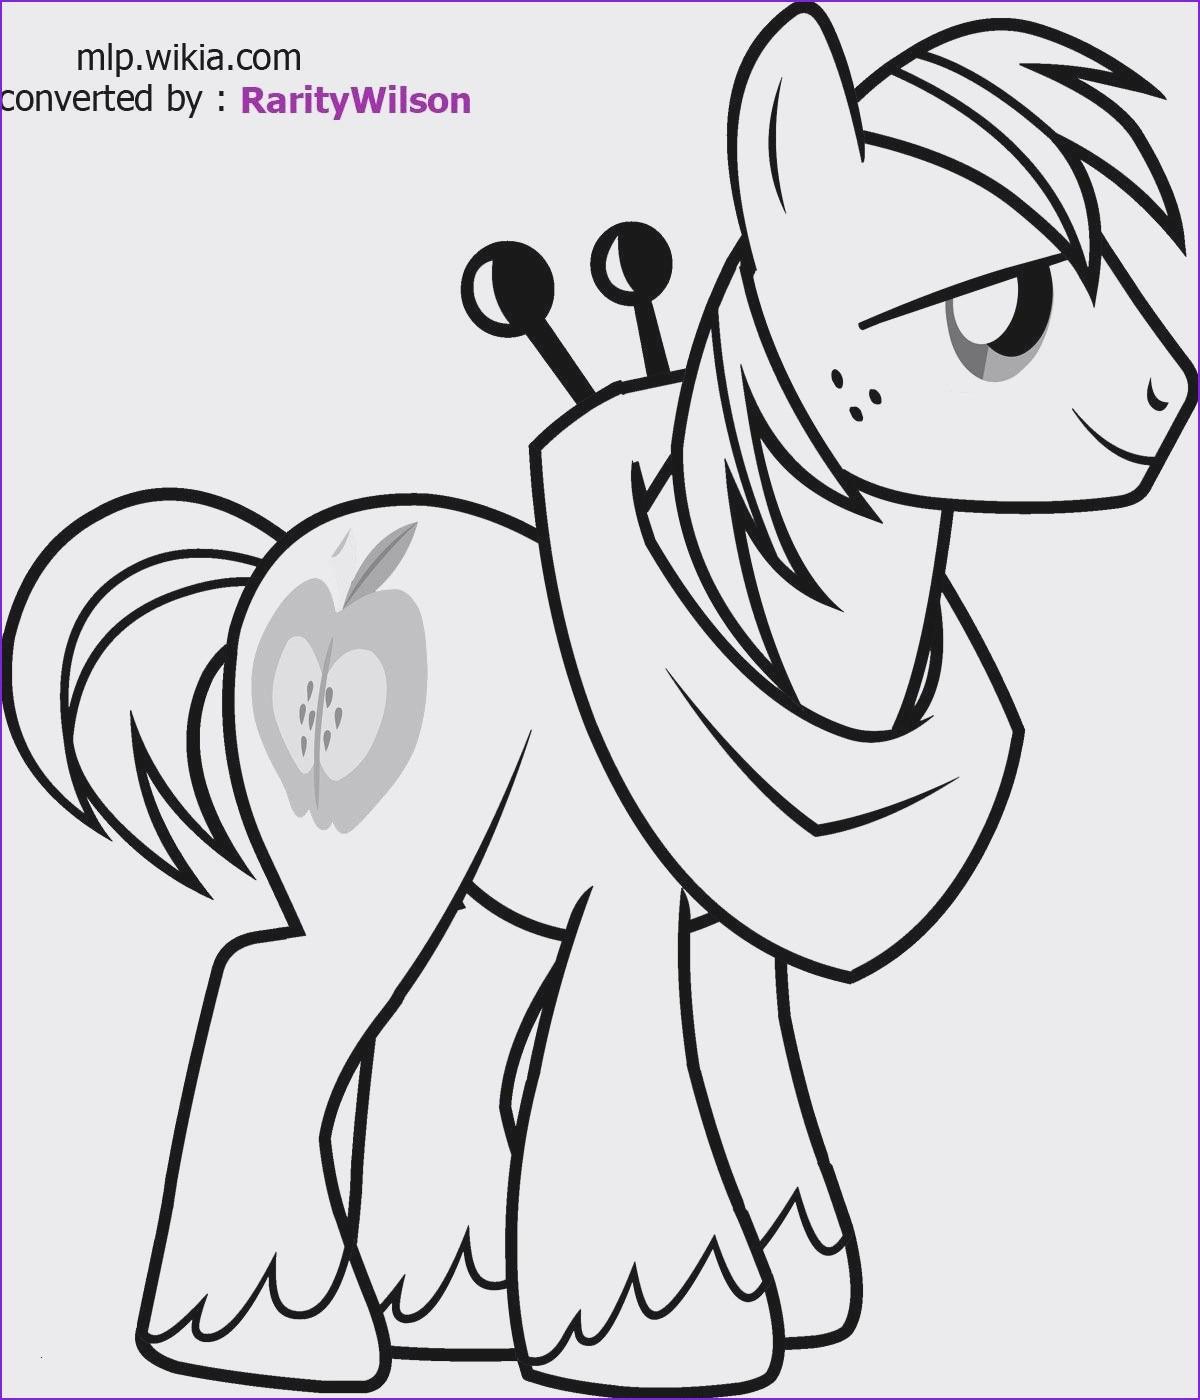 Ausmalbilder My Little Pony Equestria Girl Inspirierend 40 My Little Pony Friendship is Magic Ausmalbilder Scoredatscore Fotografieren